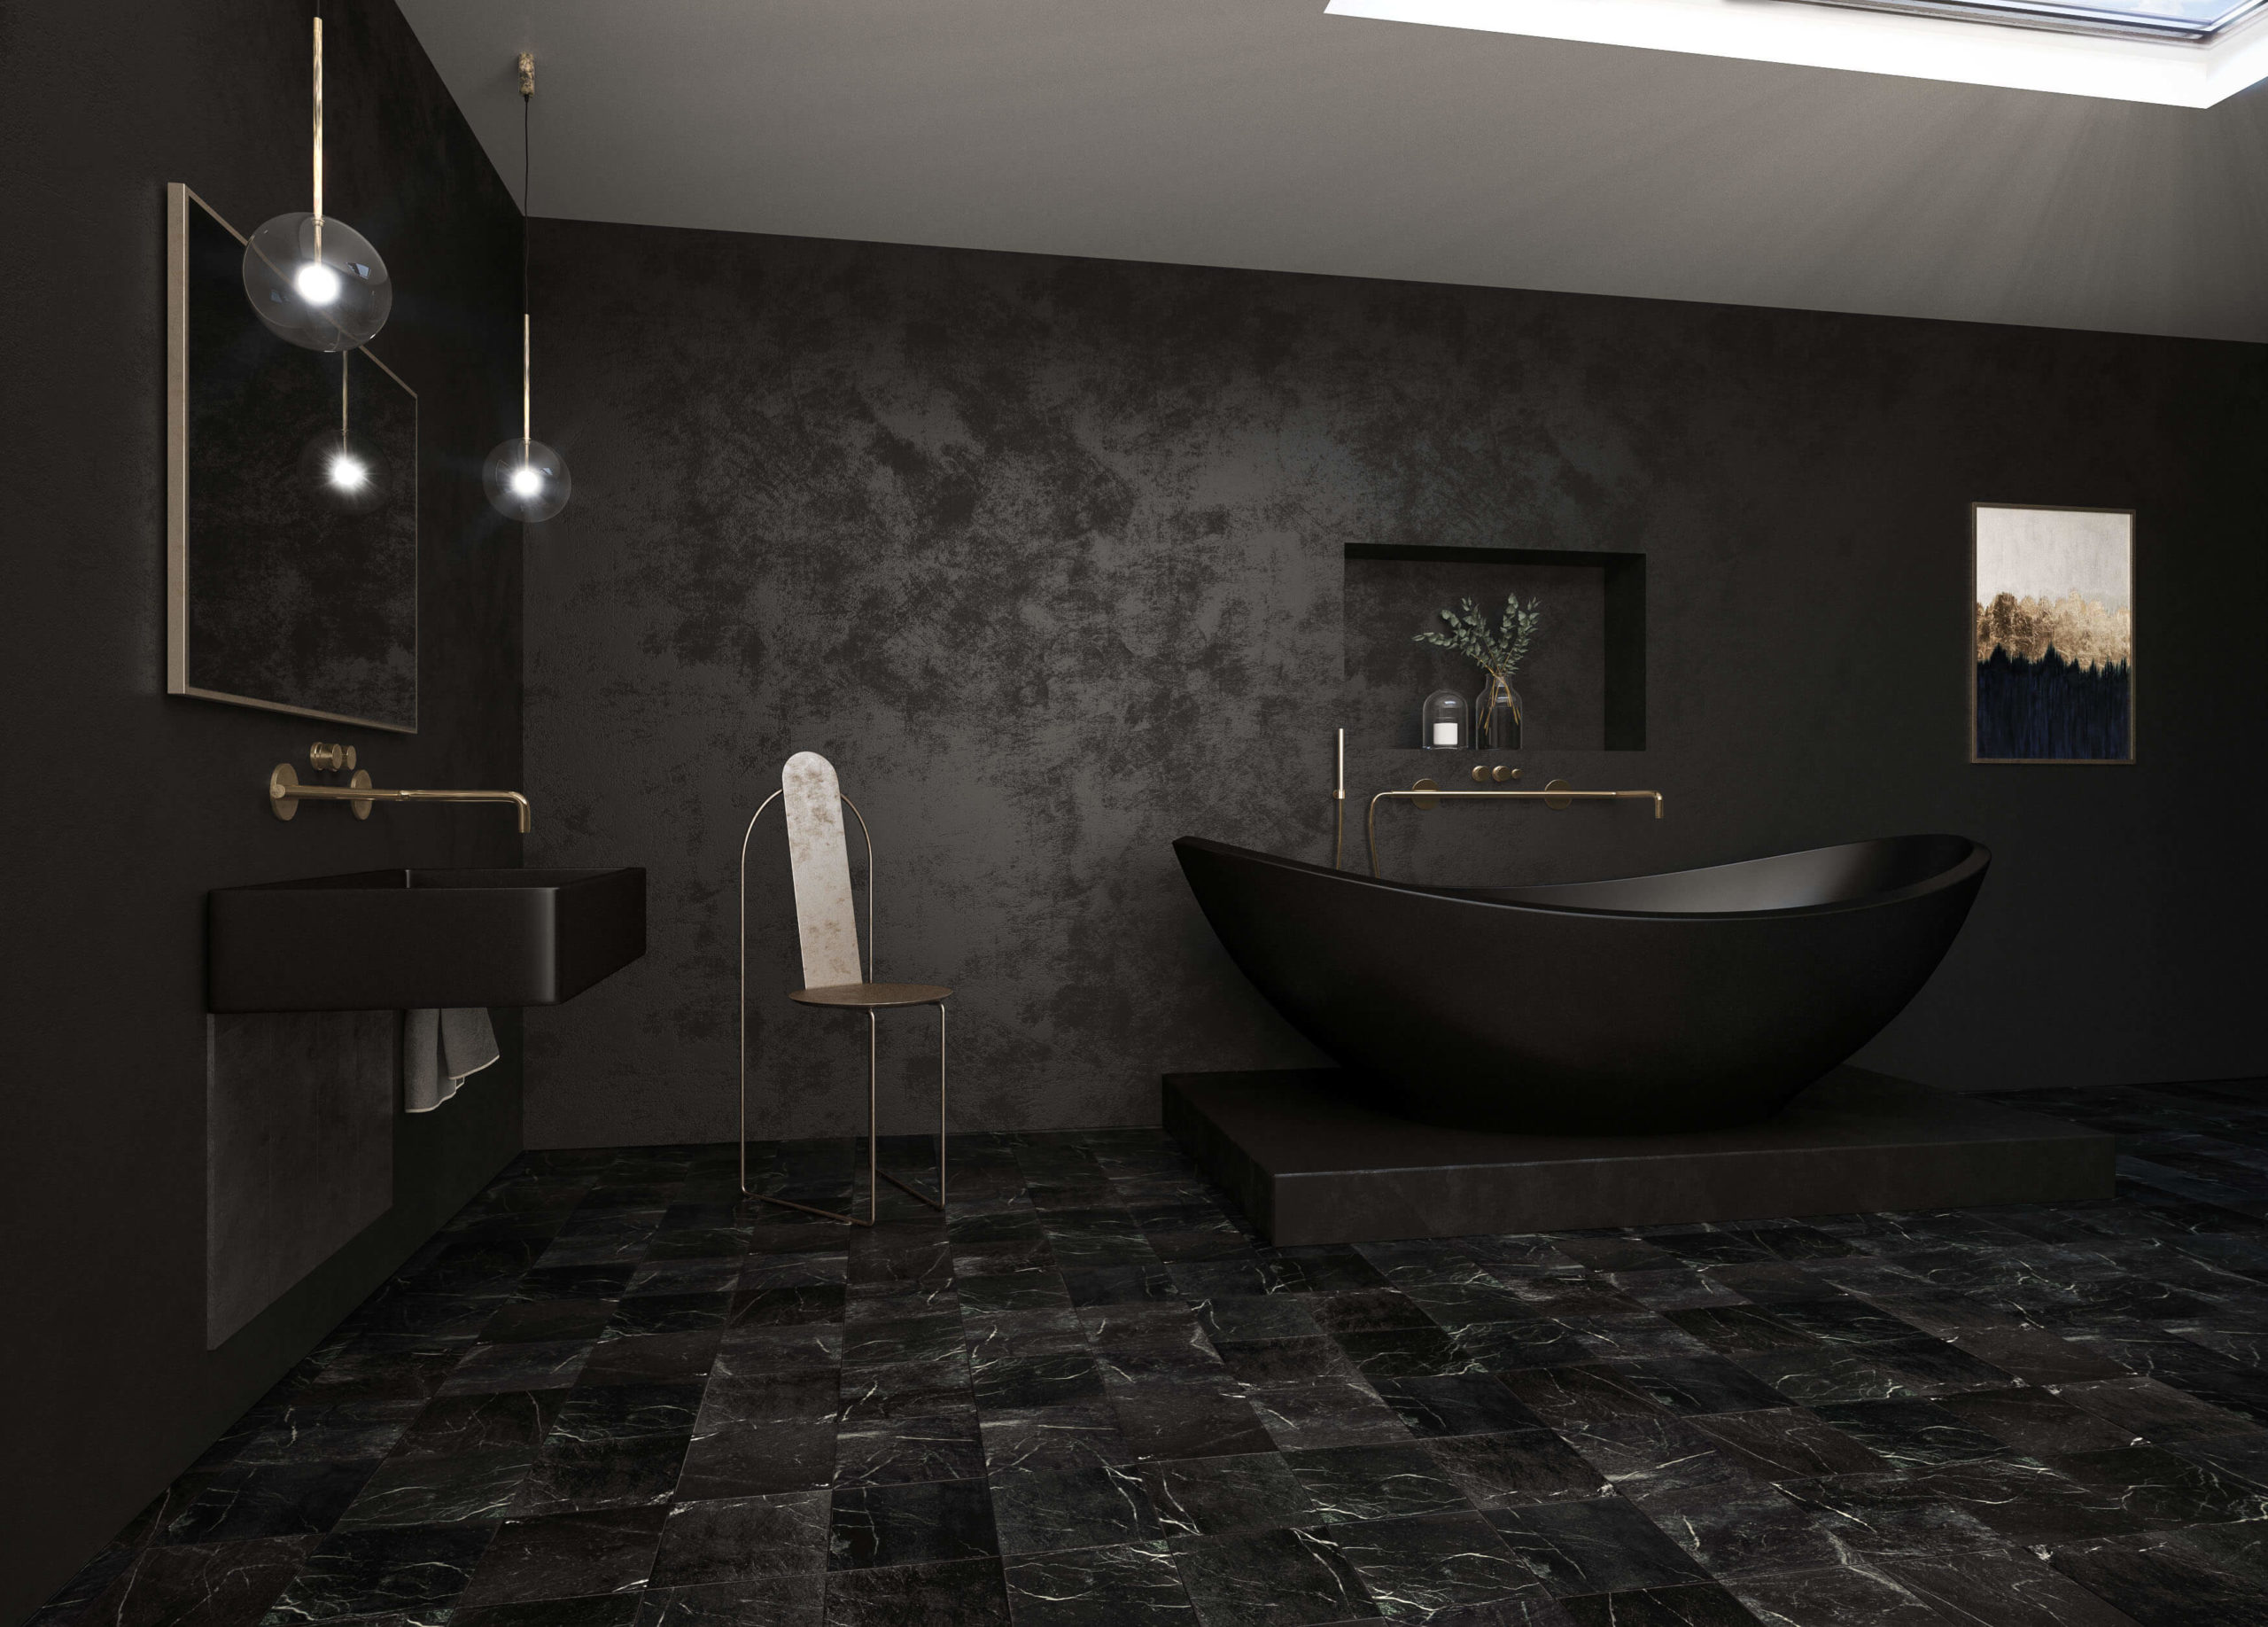 The Black Bathroom Bluedotvisual, Images Of Black Bathrooms